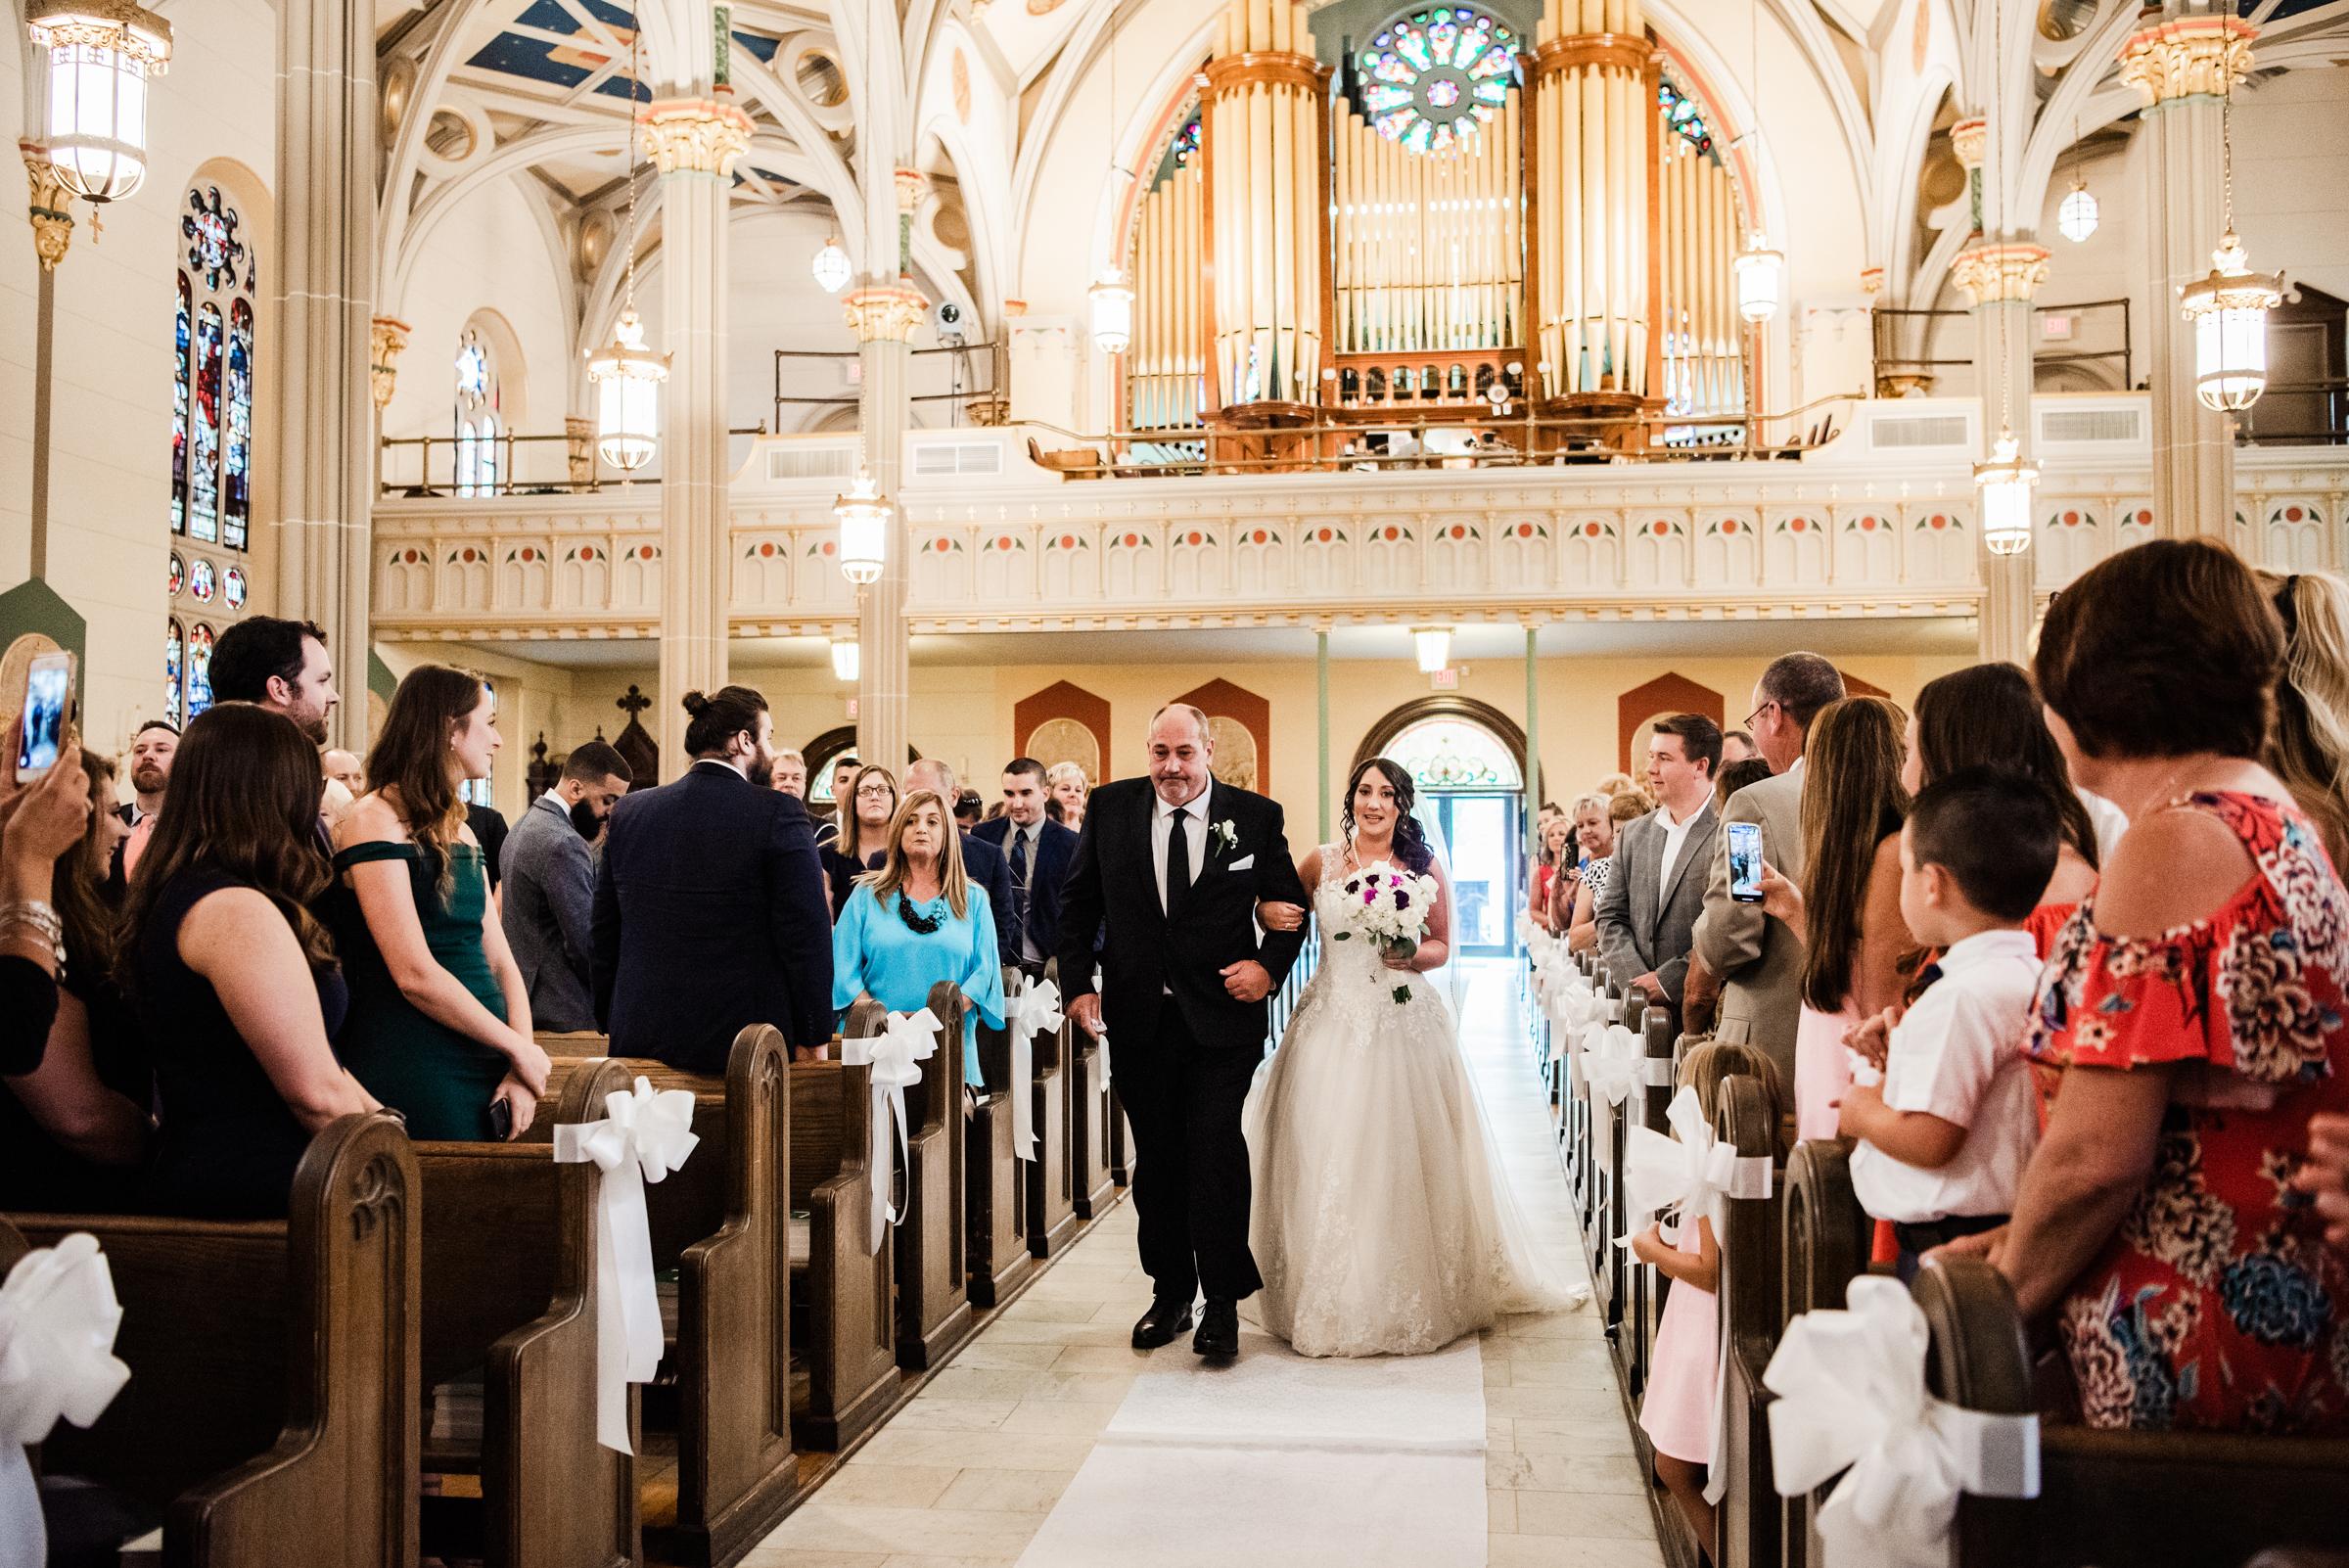 Historic_Old_St_Johns_Church_Valentinos_Banquet_Hall_Central_NY_Wedding_JILL_STUDIO_Rochester_NY_Photographer_DSC_5709.jpg